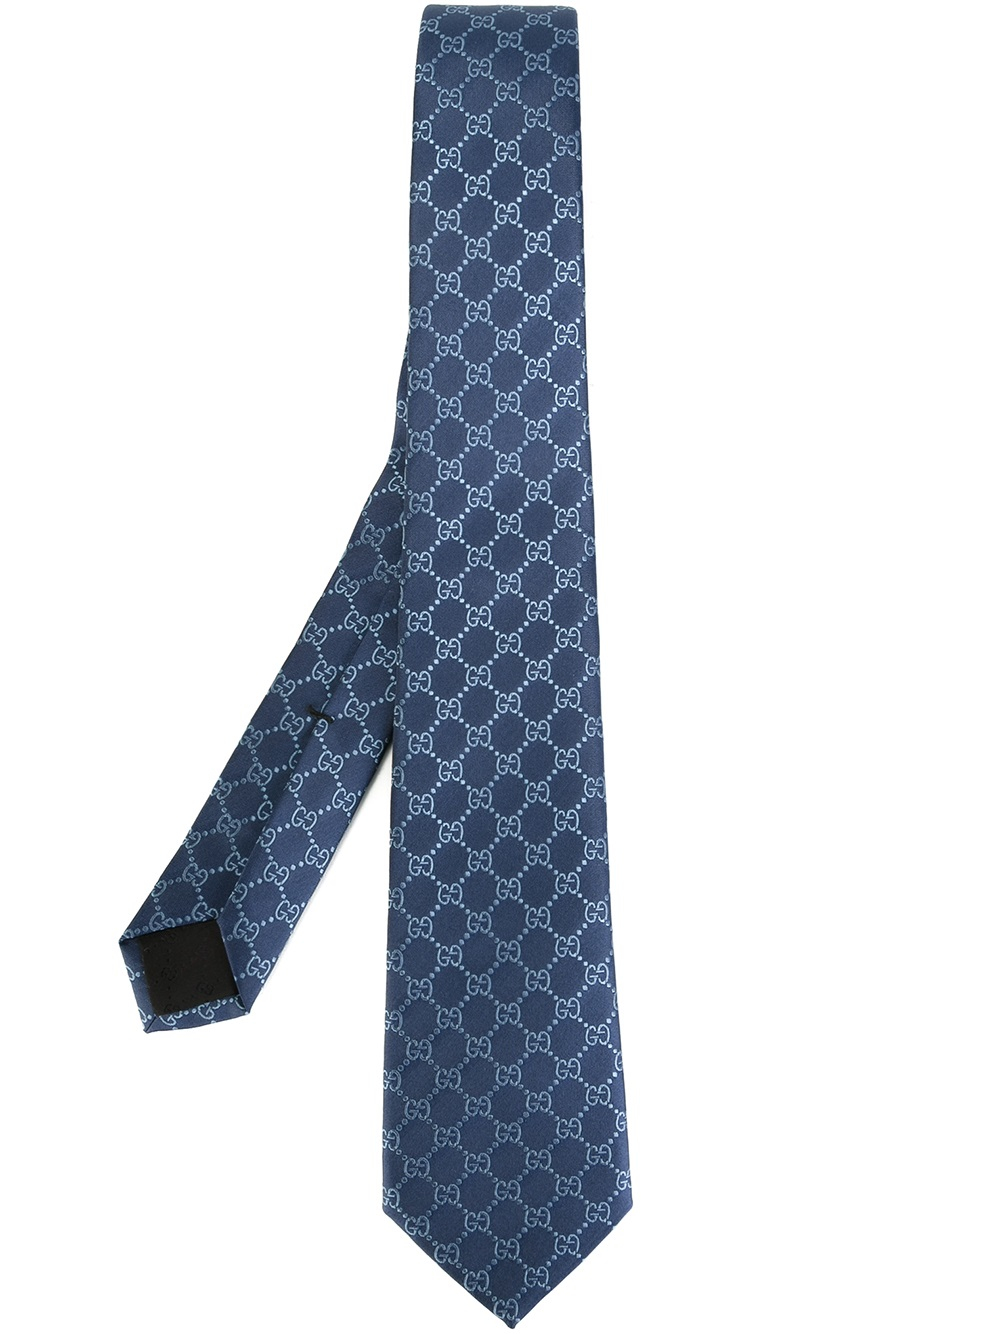 77cbe0d4a0c59 Lyst - Gucci Gg Pattern Silk Jacquard Tie in Blue for Men